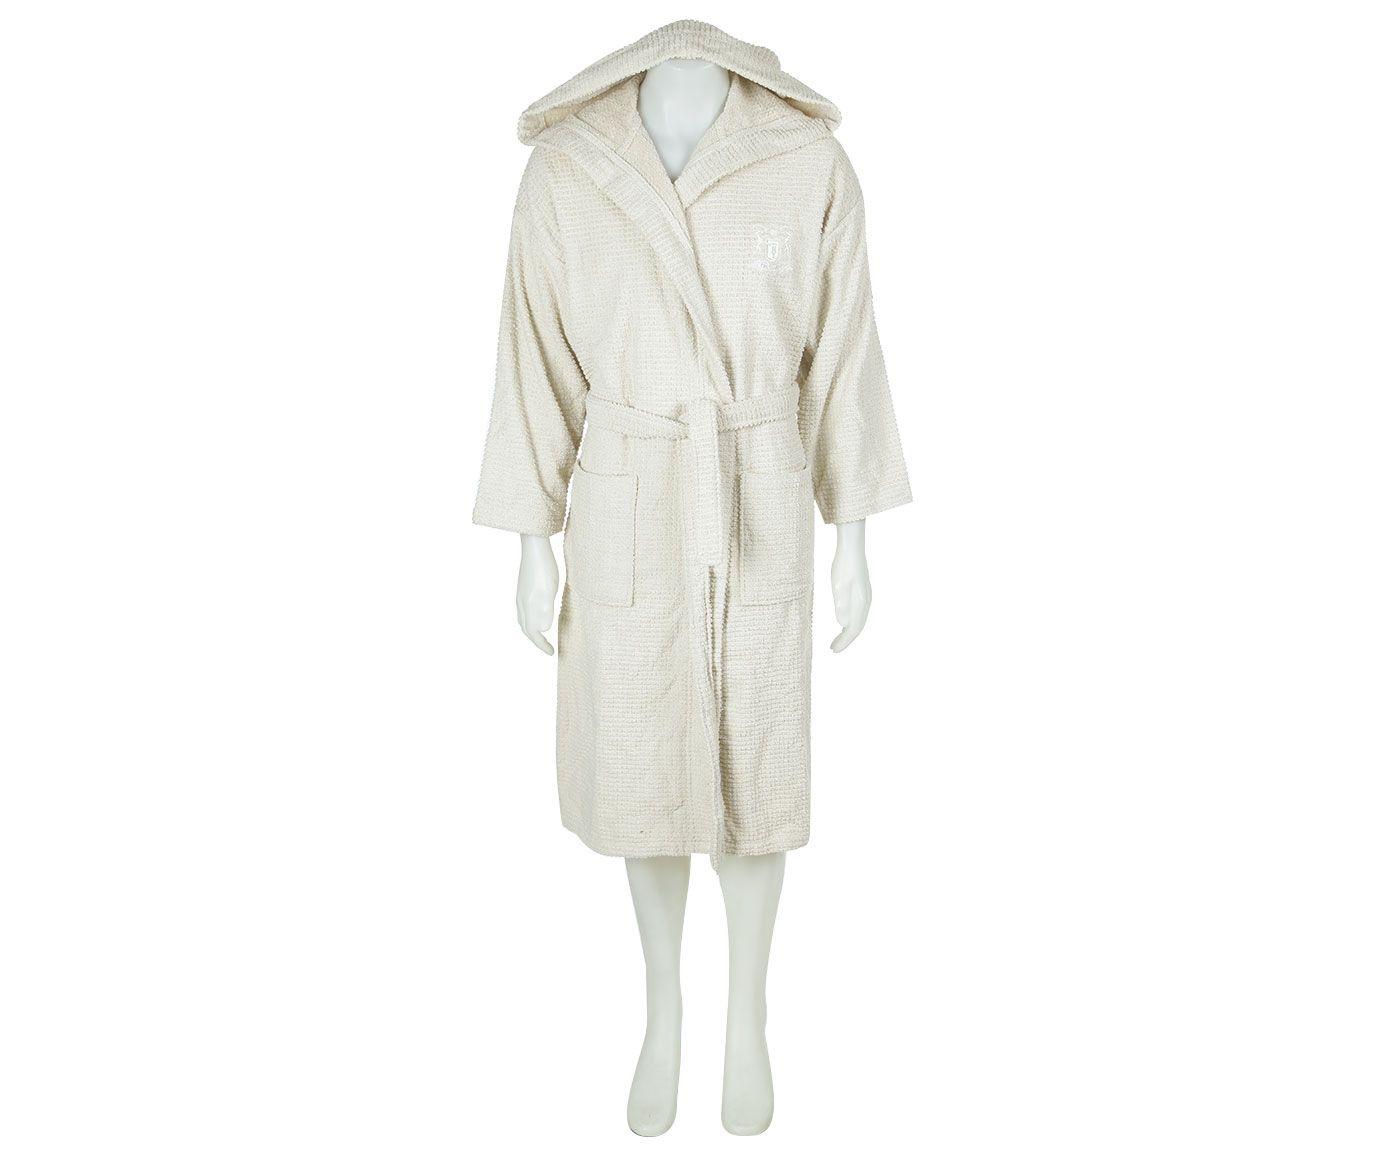 Халат Trussardi платье грация control body plus цвет бежевый 810135 skin размер l xl 50 52